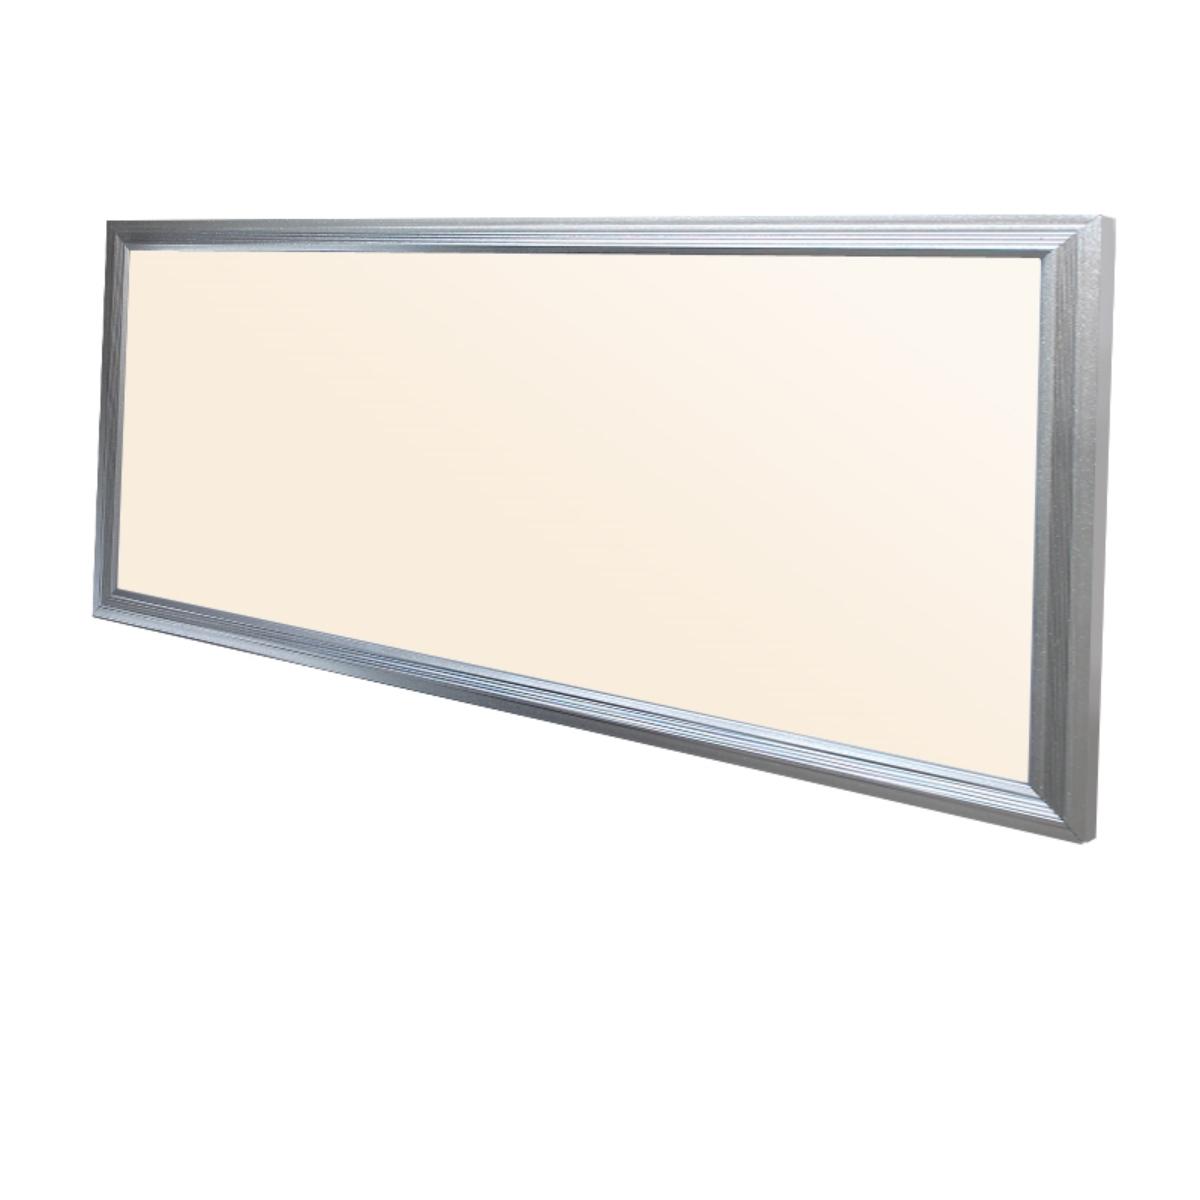 LED-Panel-60x30-cm-lamparas-ultra-planos-luce-iluminacion-blanco-3000-4000-6000K